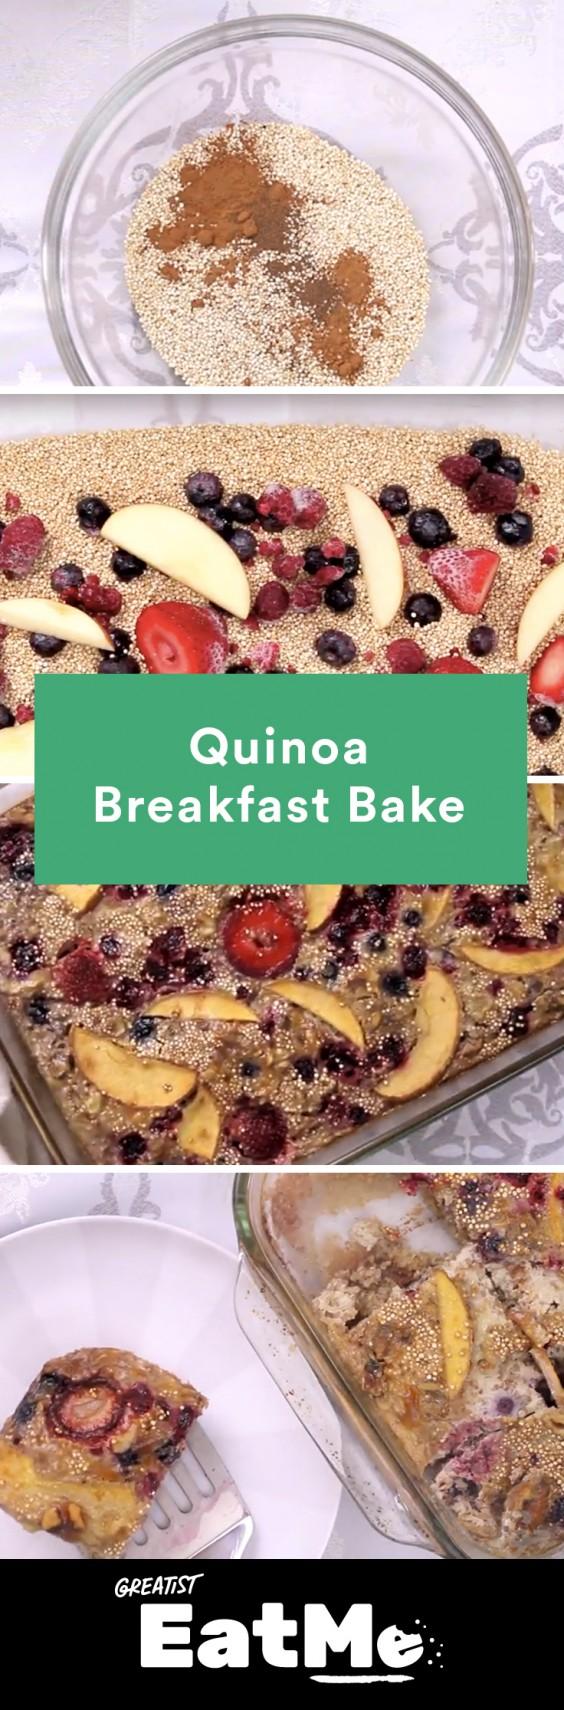 Eat Me Video: Quinoa Breakfast Bake